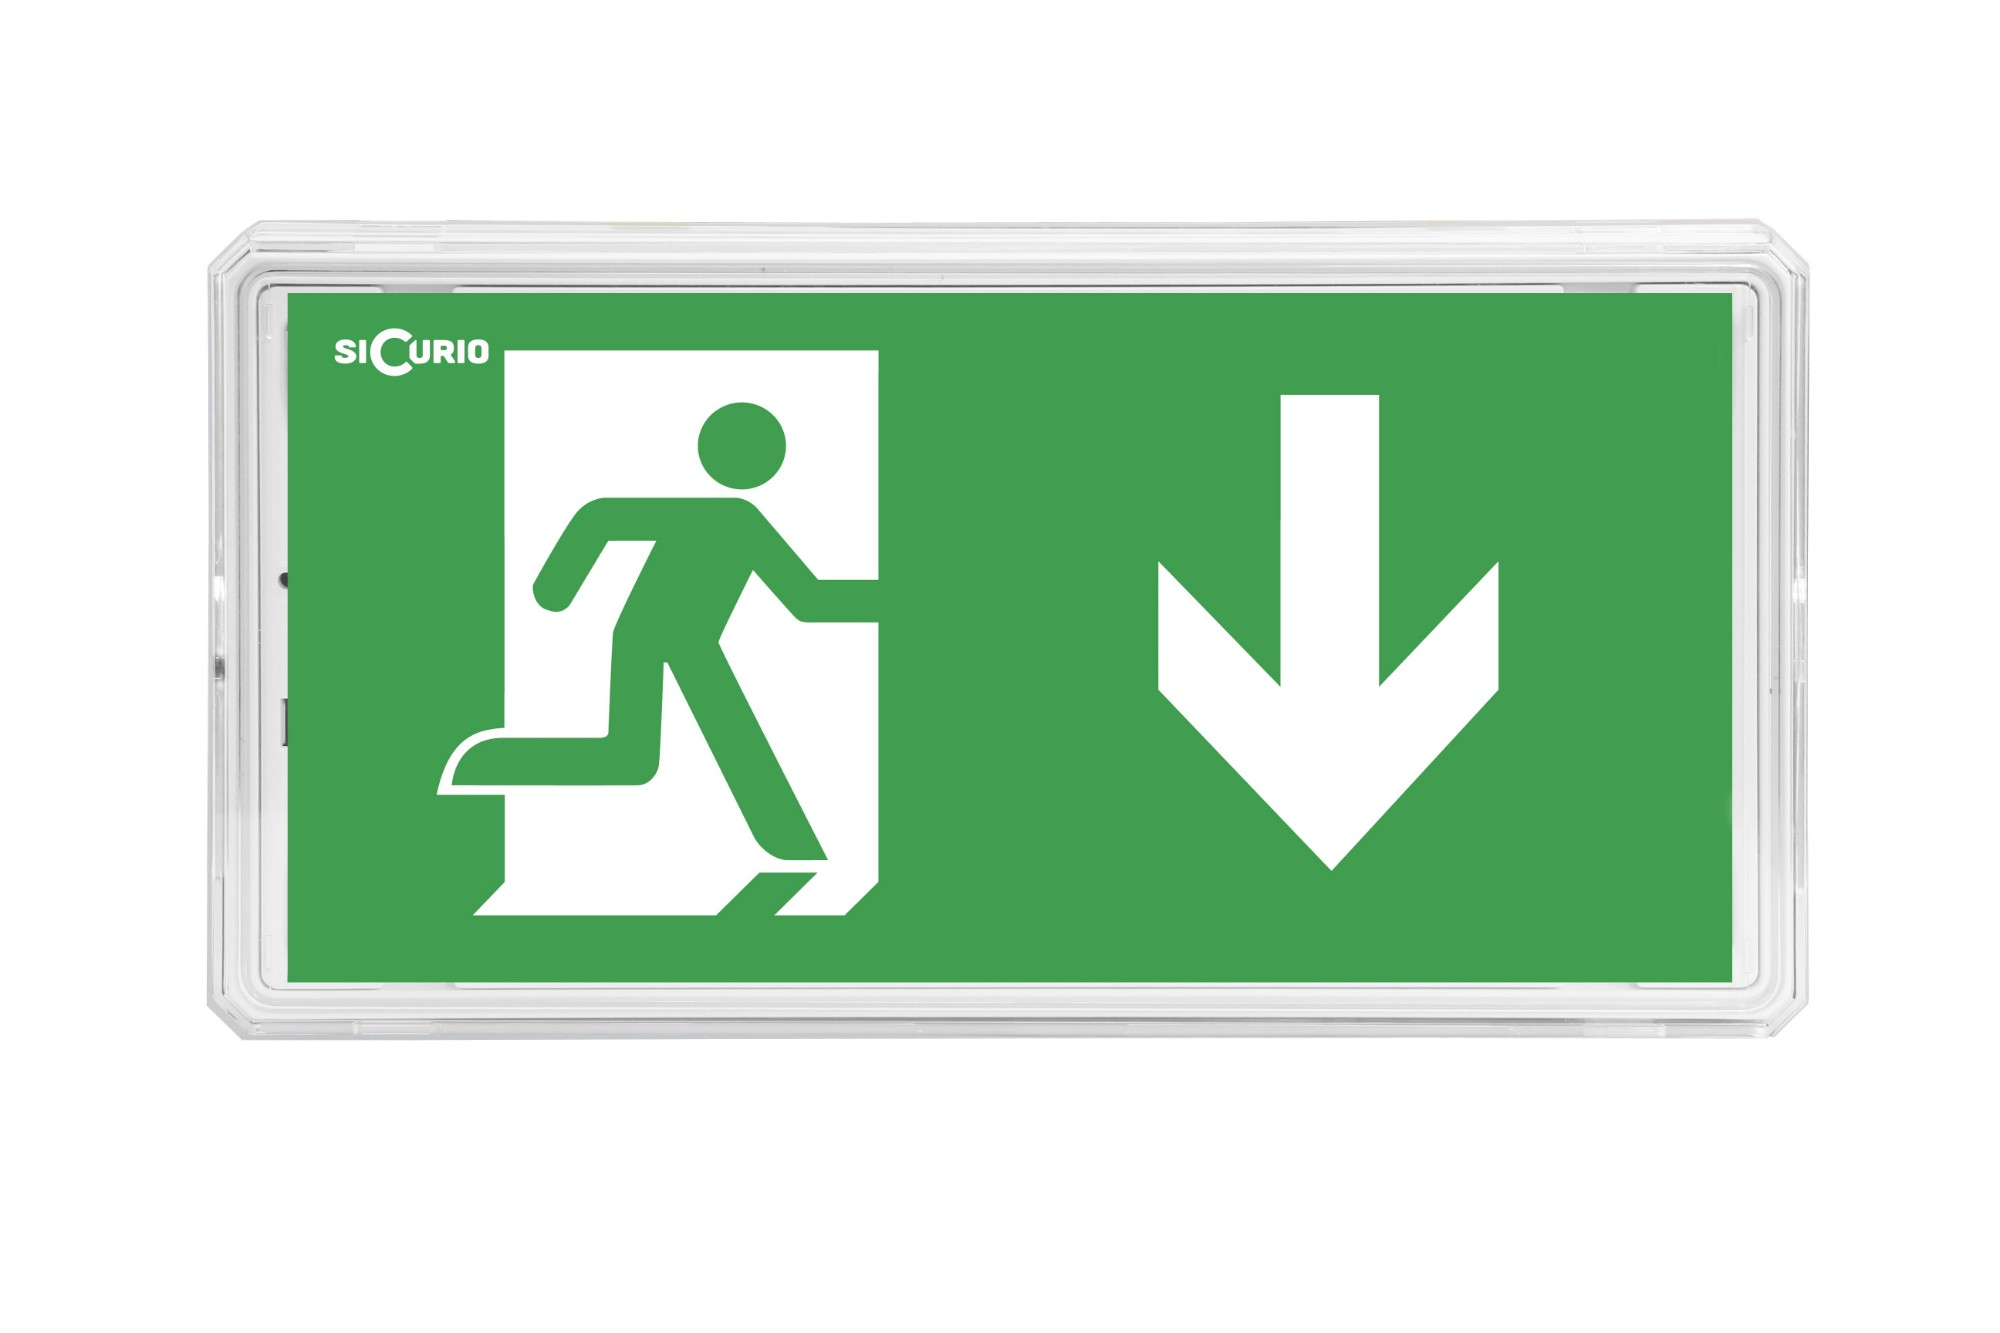 SiCurio ExitIP emergency lamp Green,White